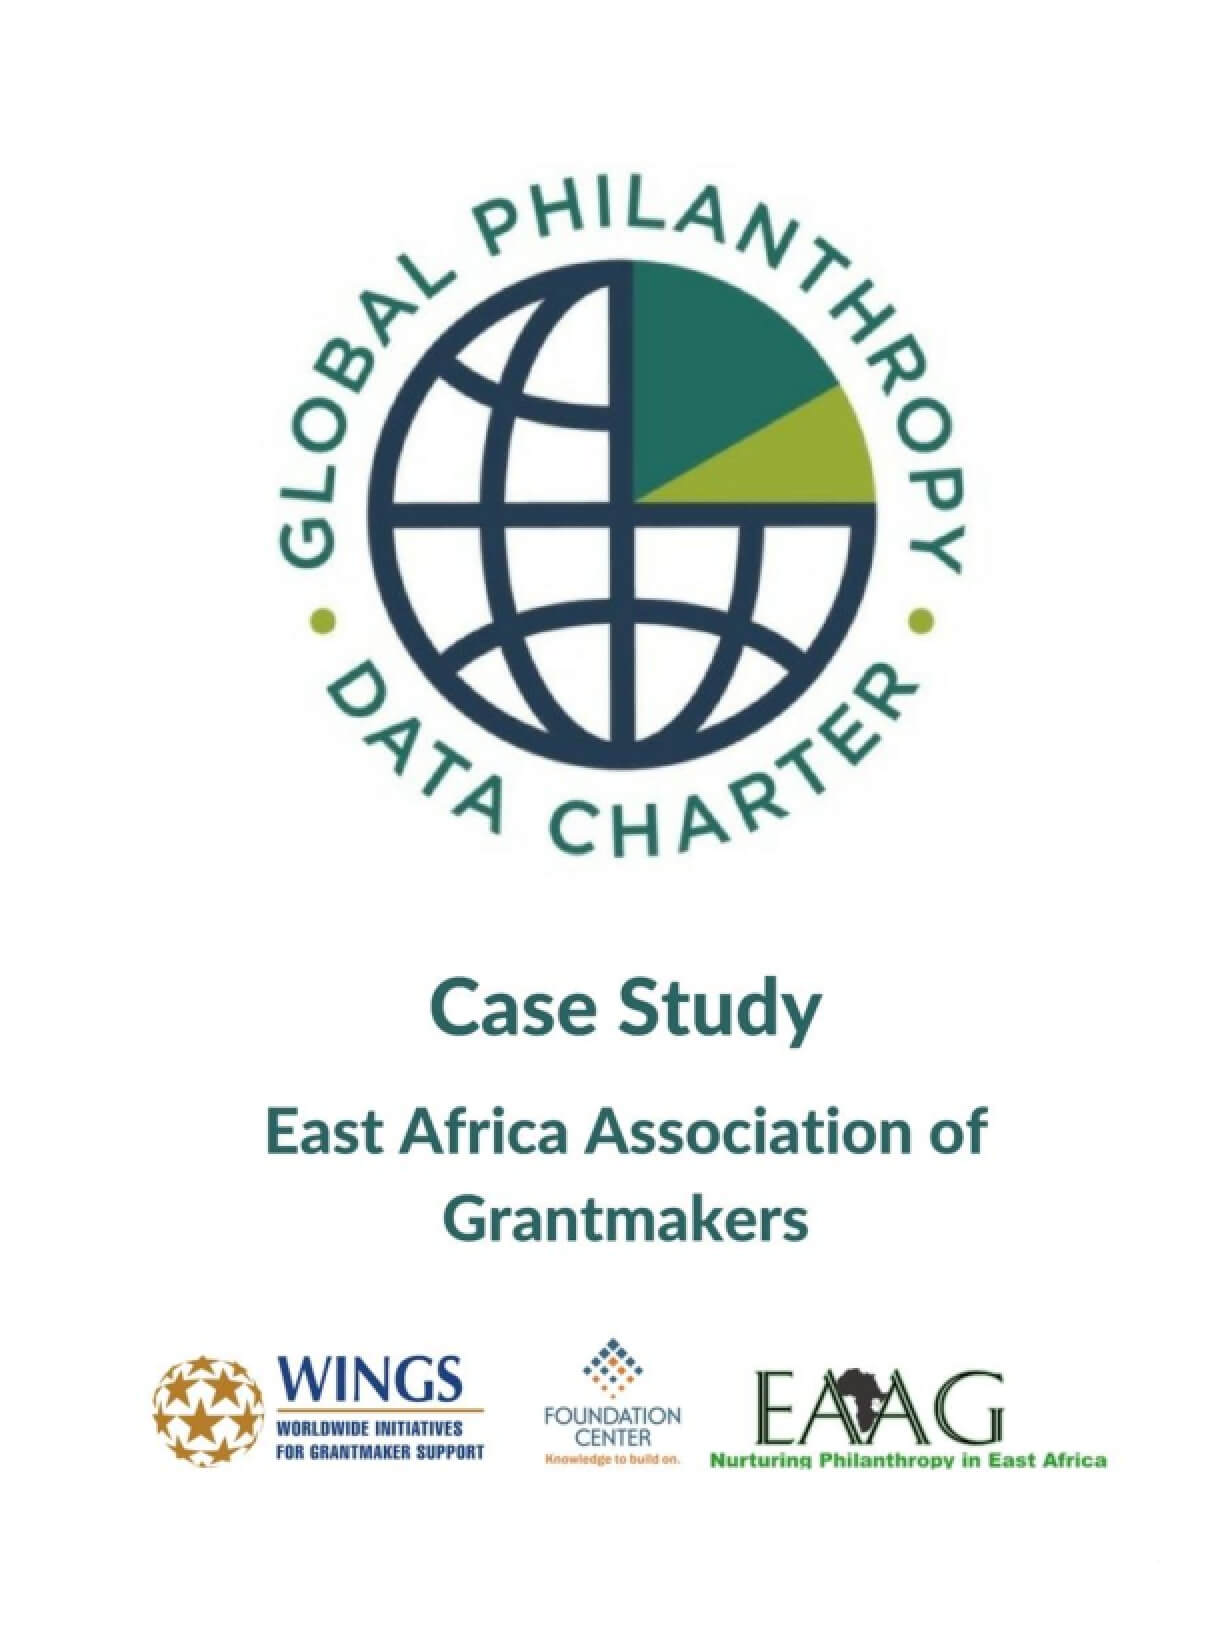 Global Philanthropy Data Charter - East Africa Association of Grantmakers Case Study